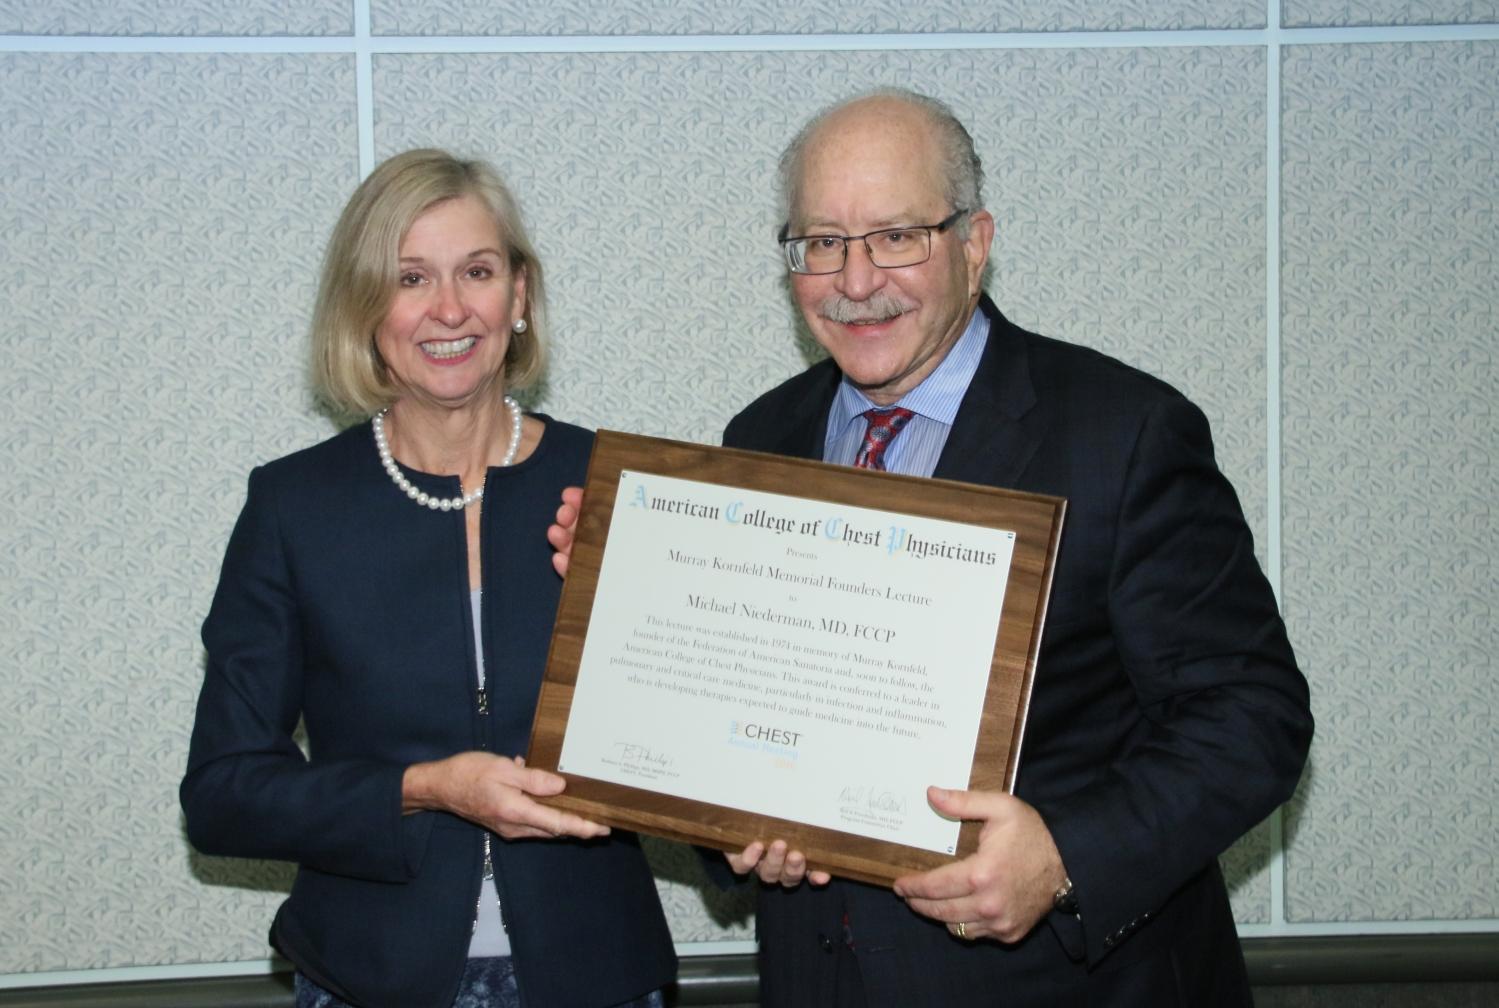 Drs. Michael Niederman and Barbara Phillips